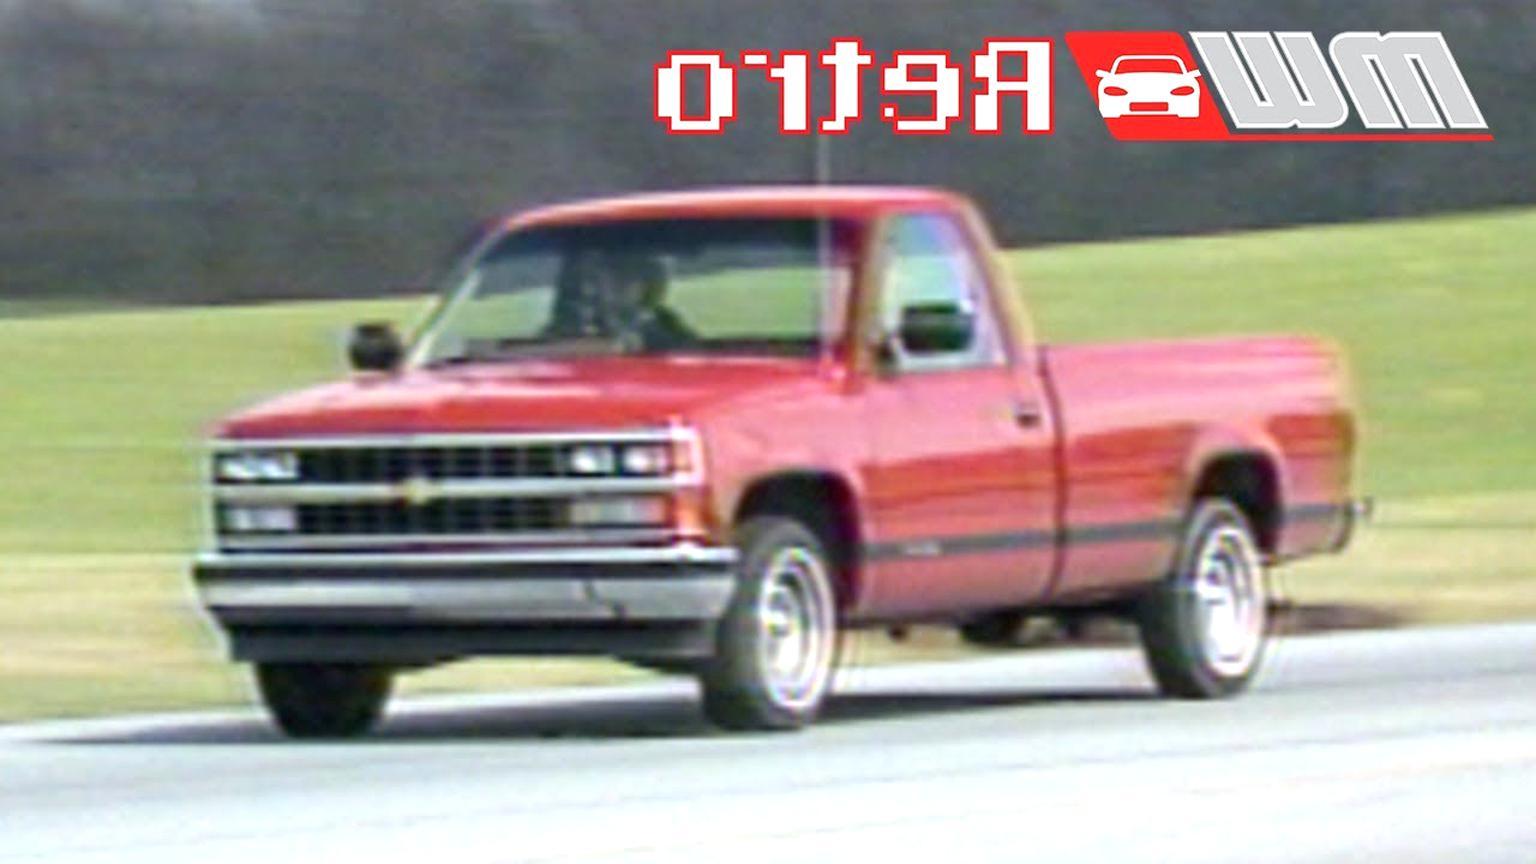 1988 chevy silverado for sale